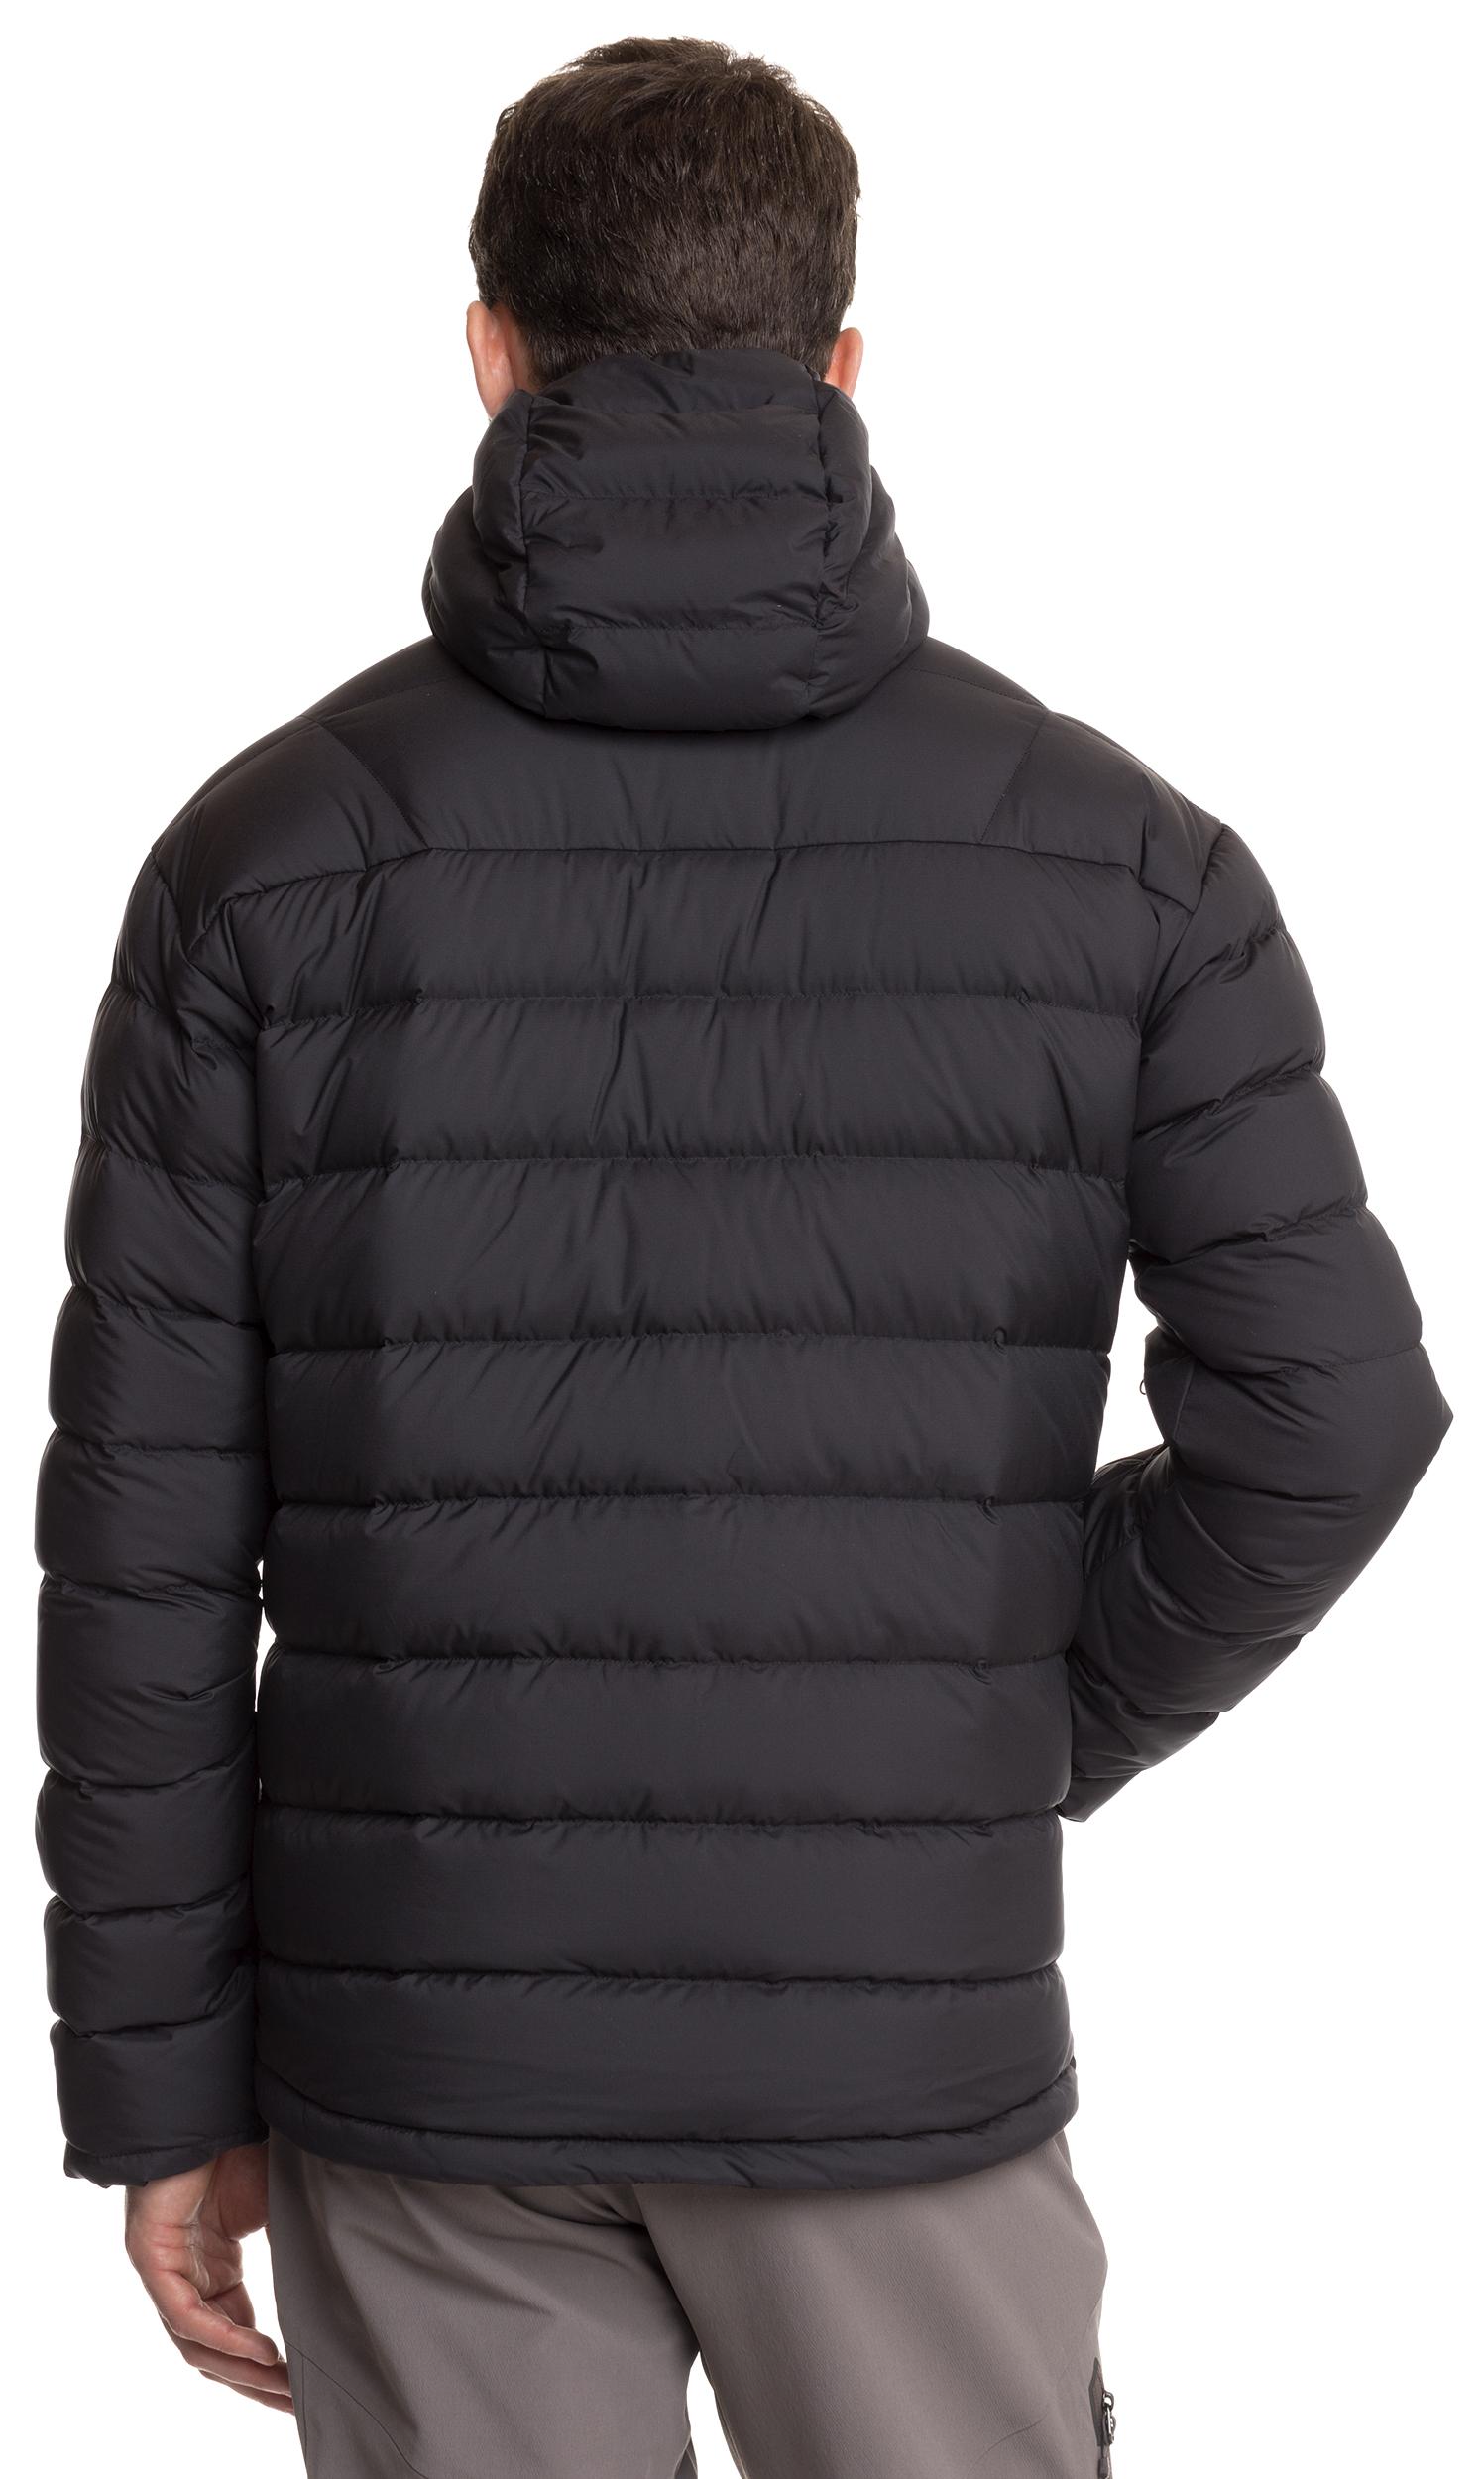 MEC Tremblant Jacket - Men's